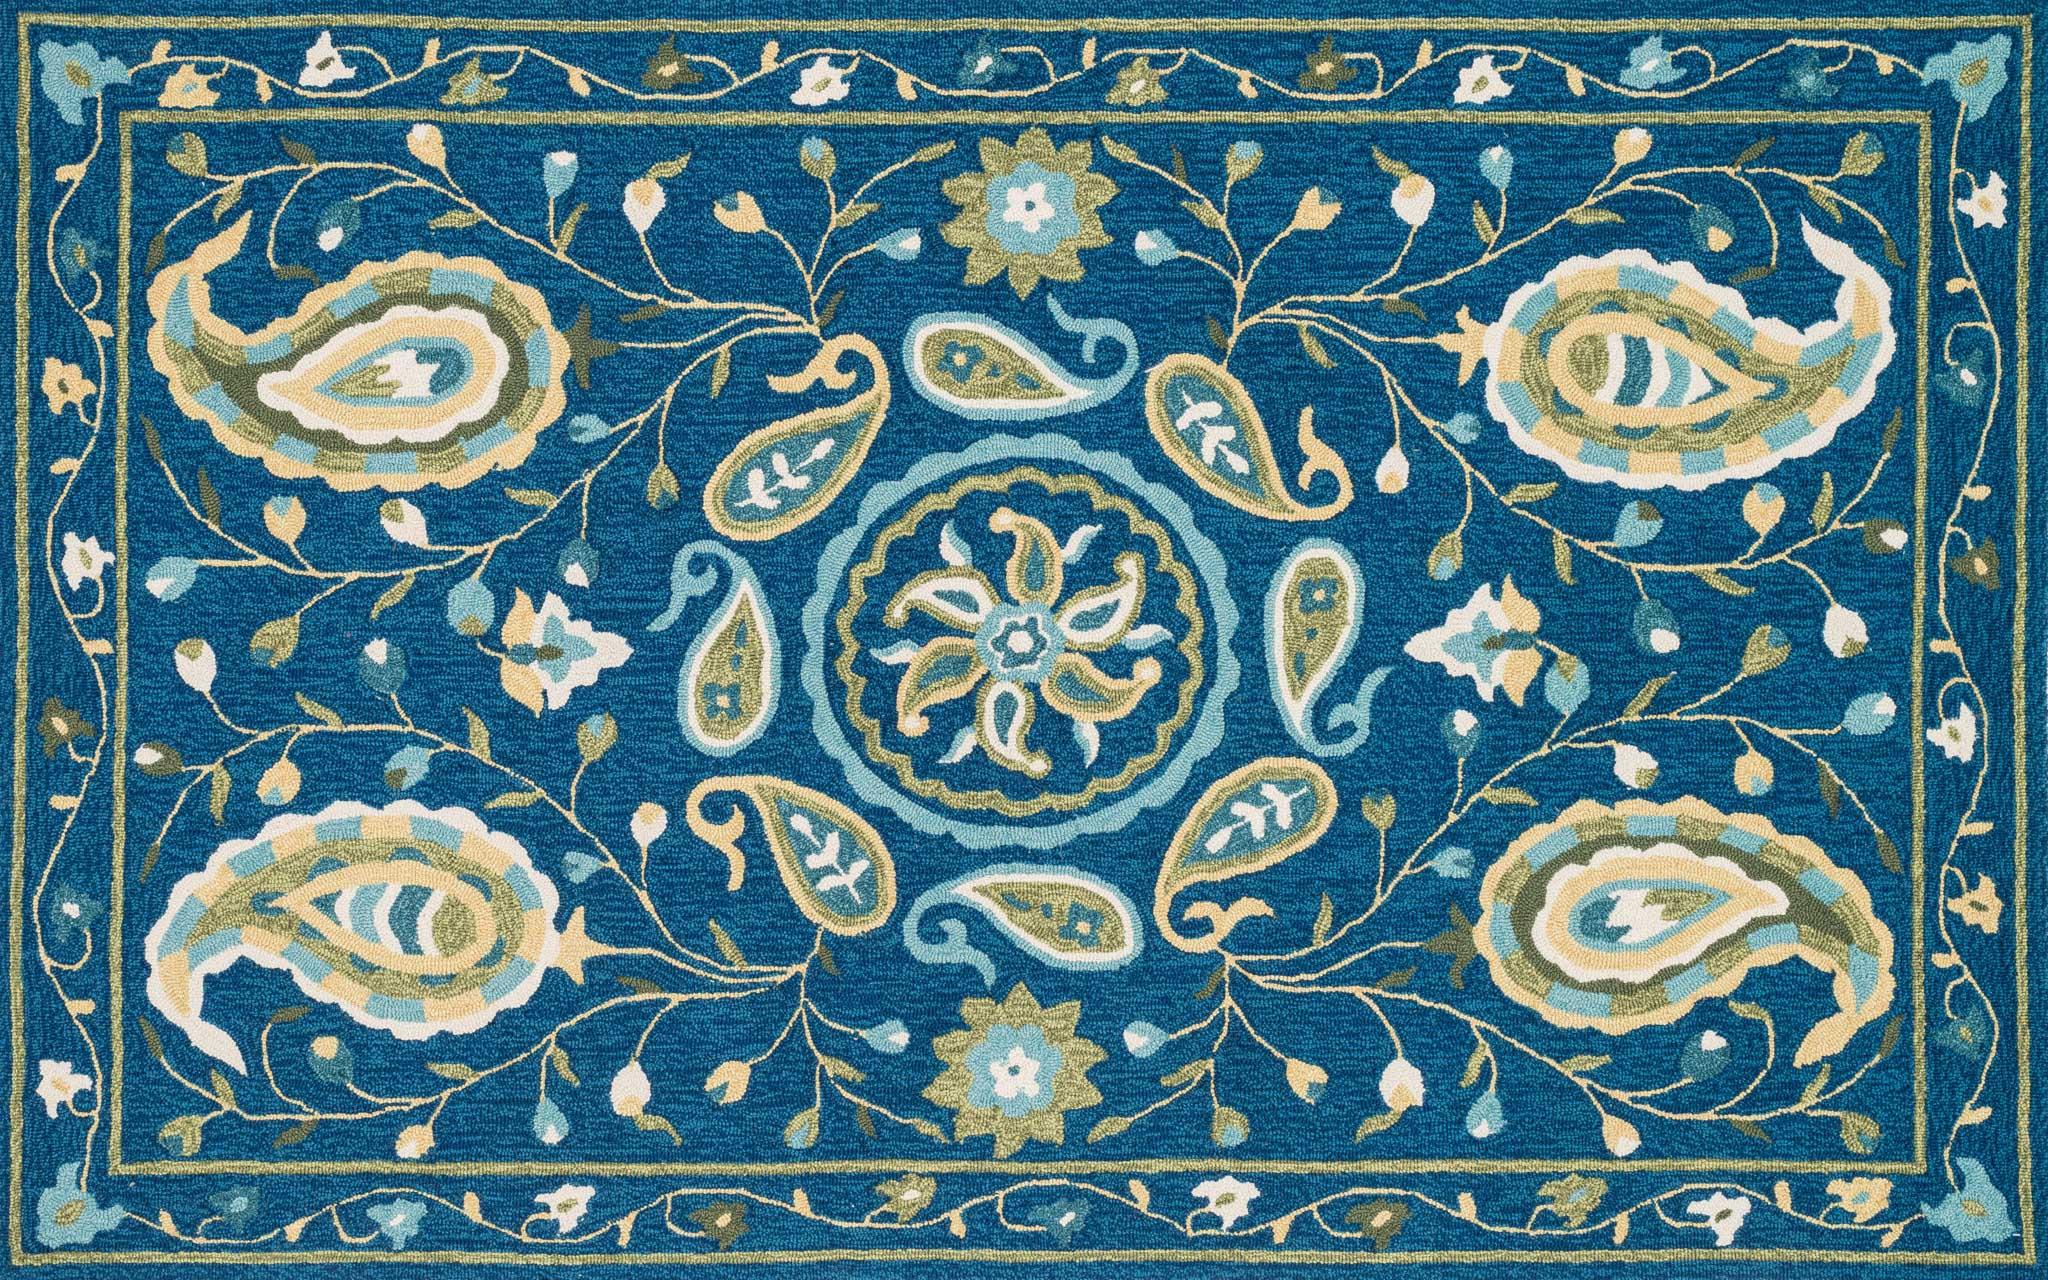 Loloi Francesca Fc 53 Blue Green Rug